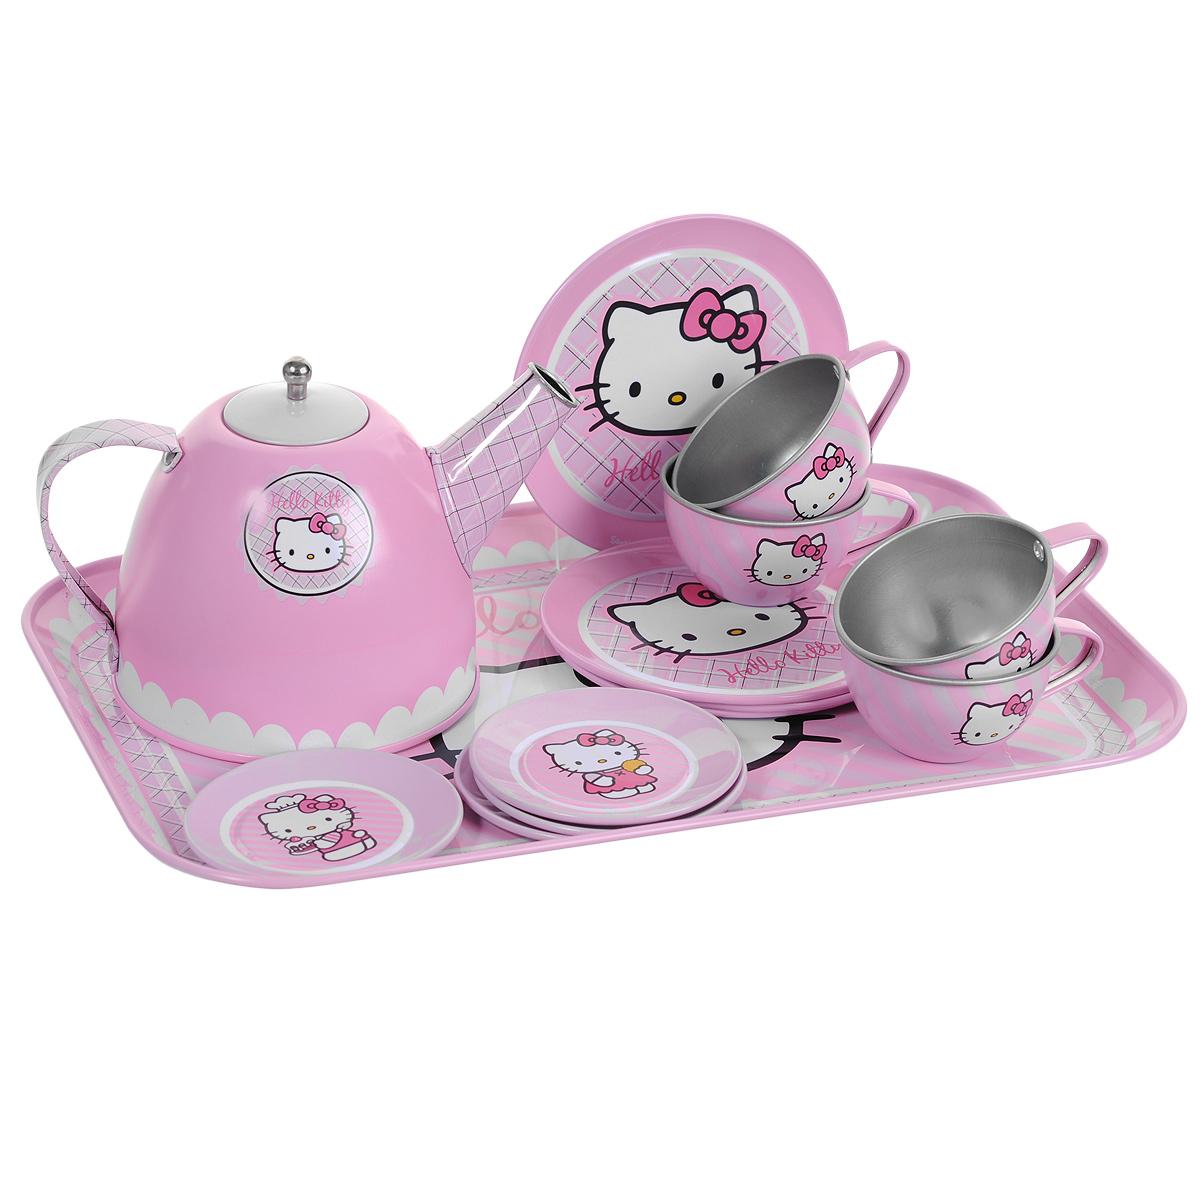 Smoby Набор посудки Hello Kitty, 14 предметов smoby посуды 14 предметов хелло китти